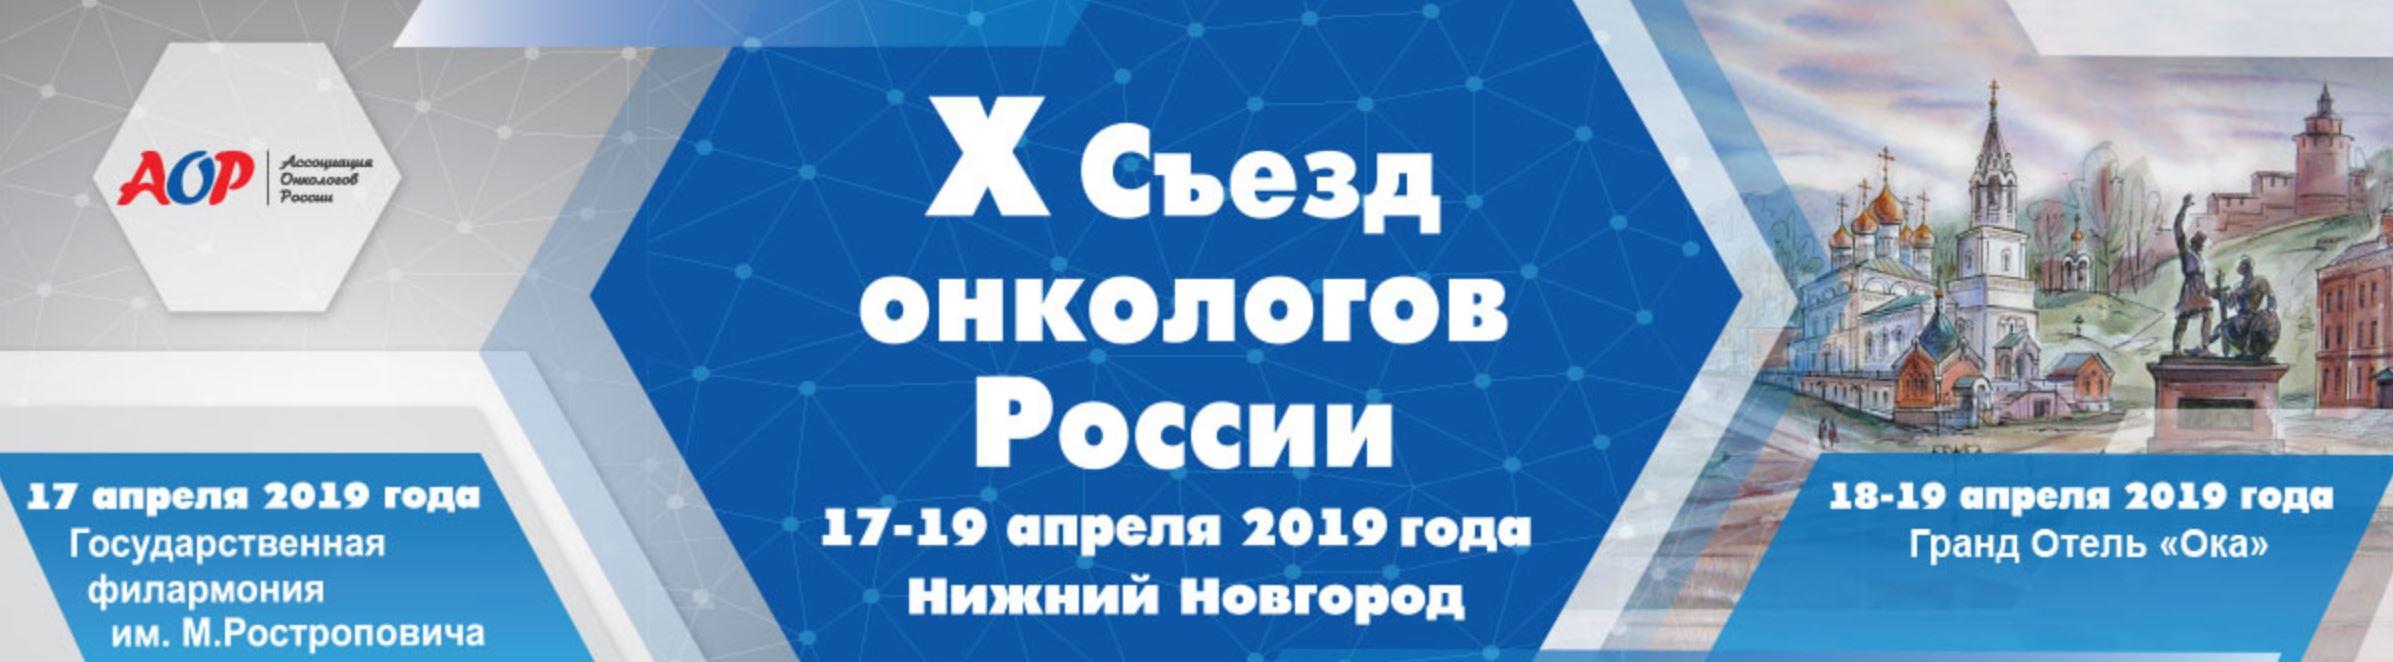 Подача тезисов на Х Съезд онкологов России